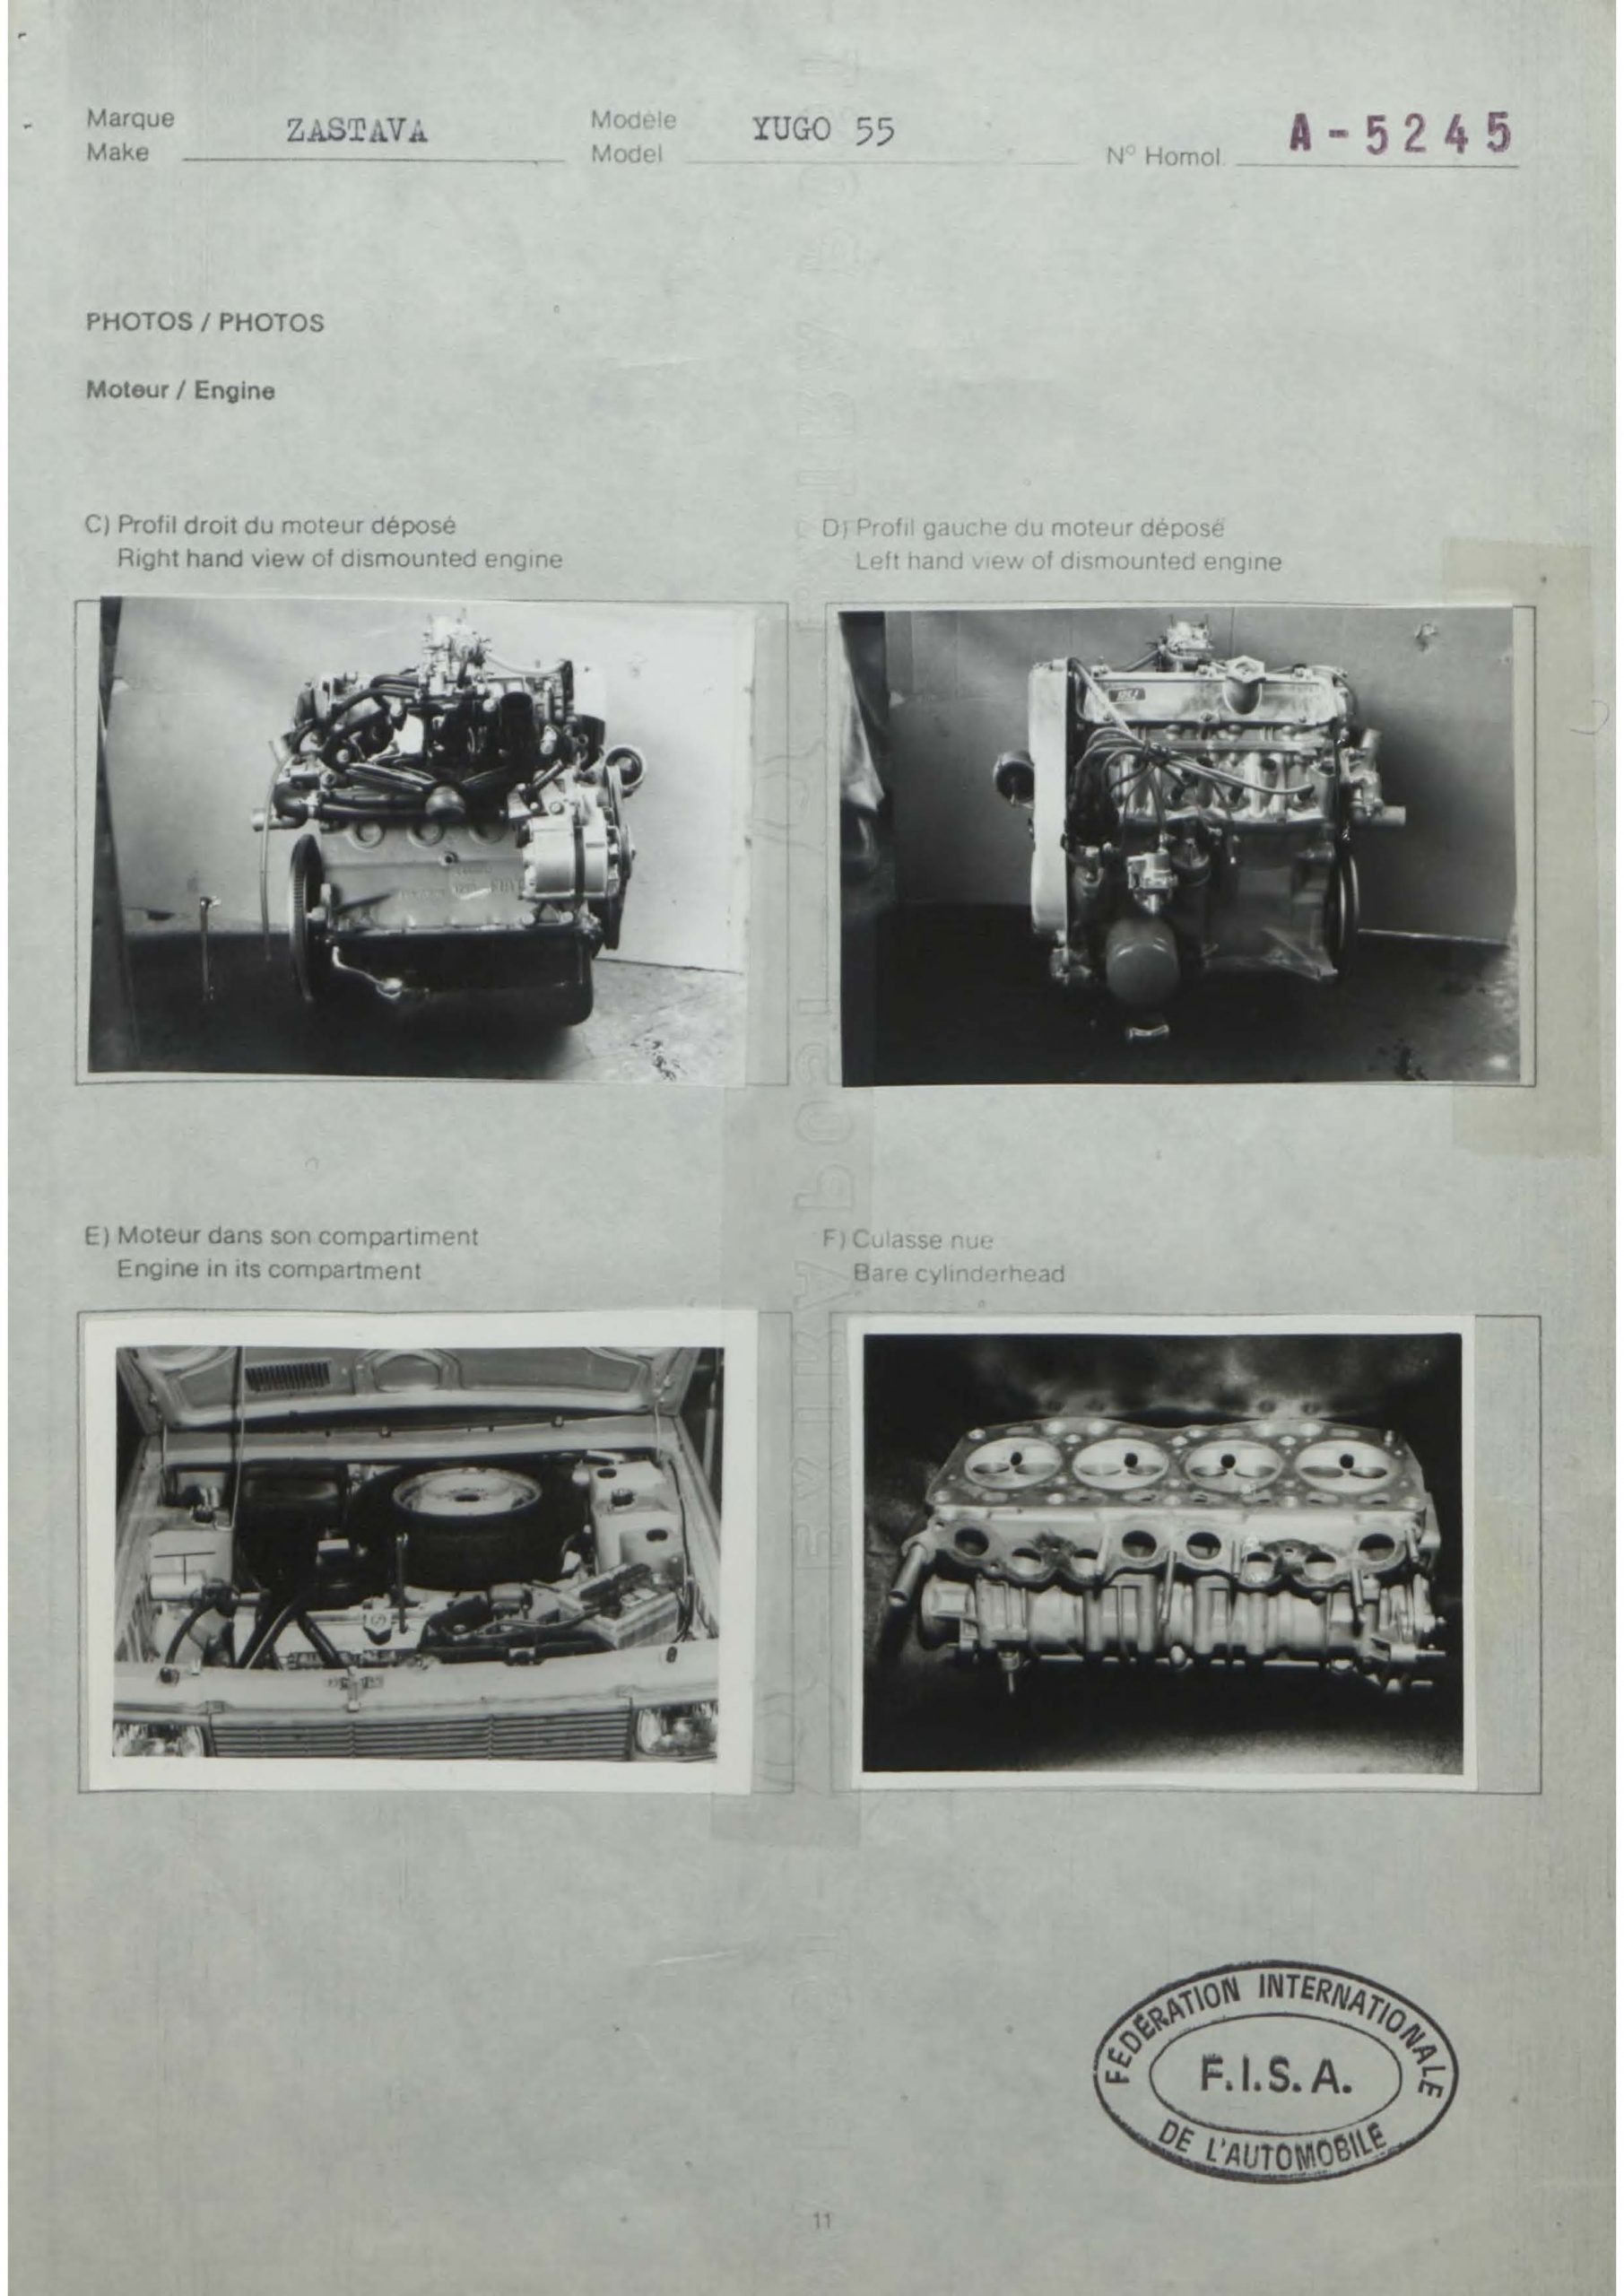 yugo homologation form engine